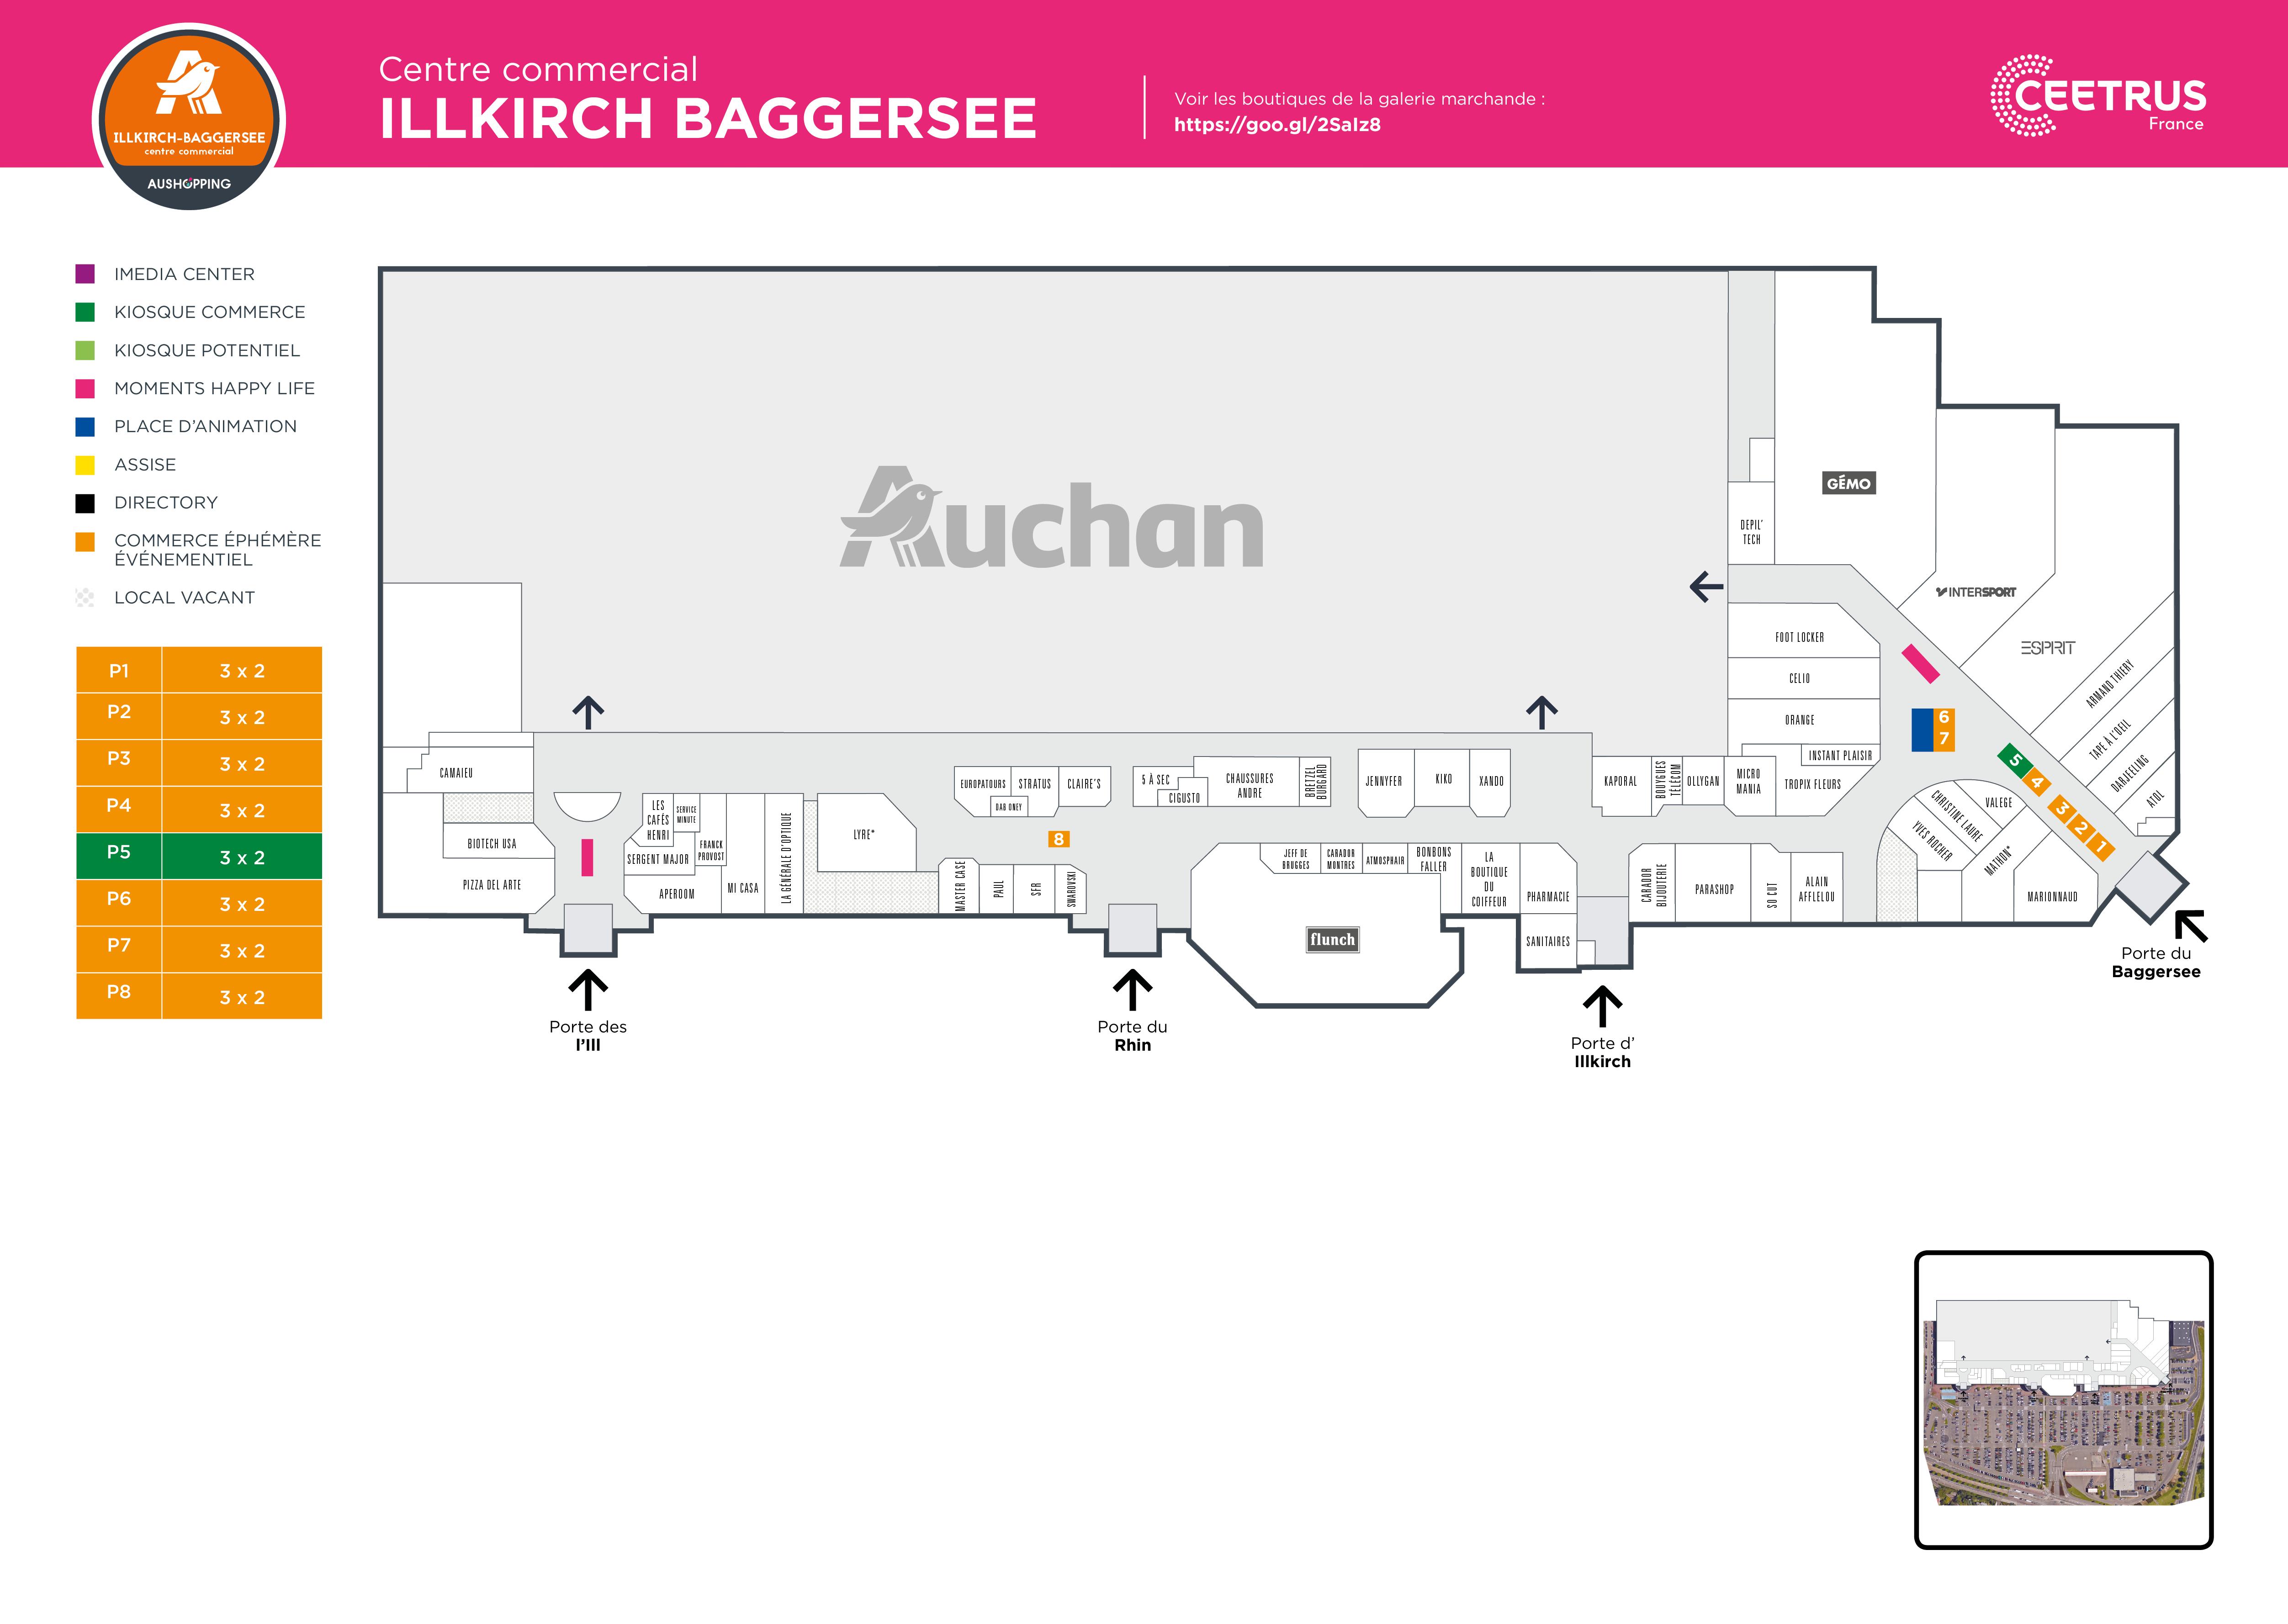 Plan Illkirch Baggersee Auchan